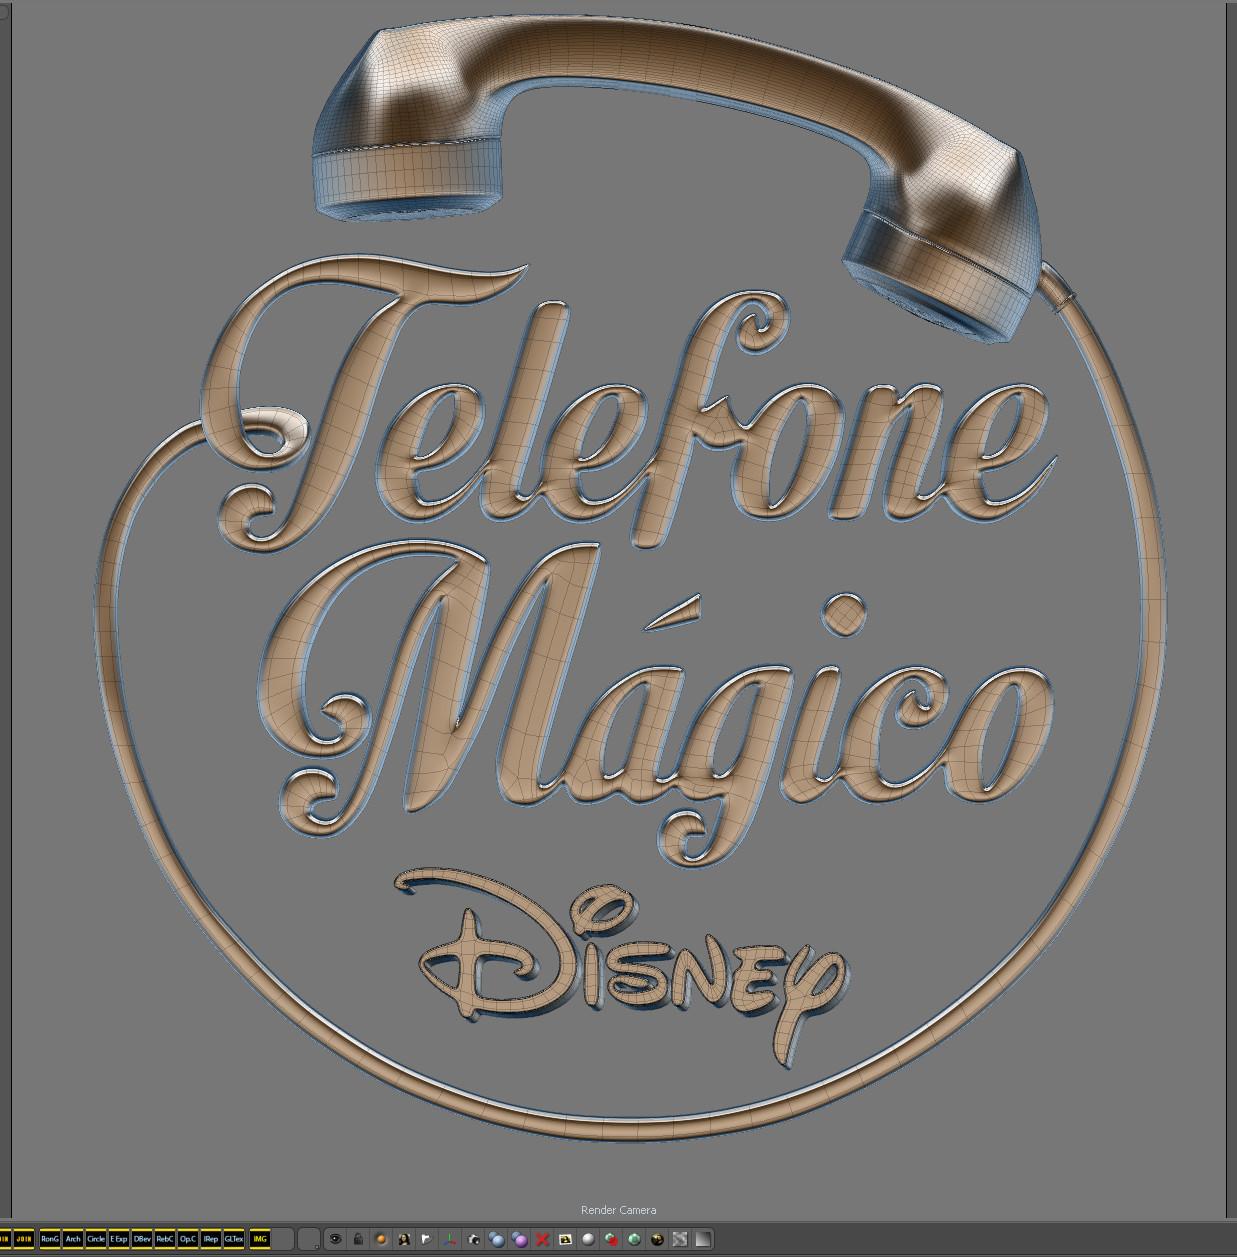 Tharso arrue 01 telefone magico disney mesh